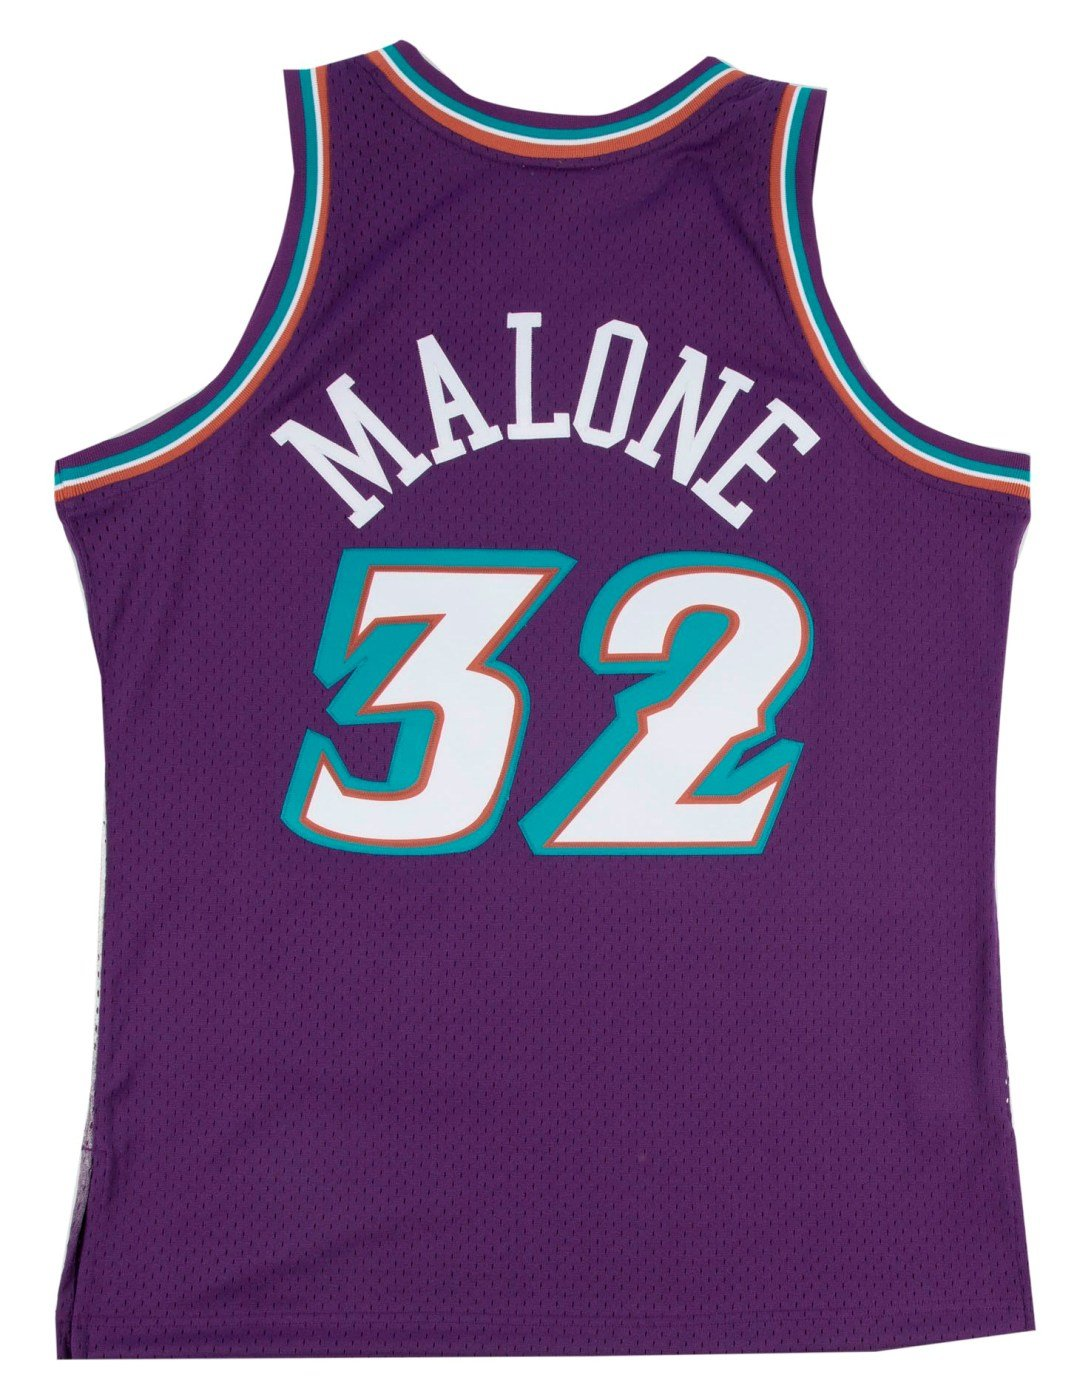 low priced a191f 570d3 Mitchell & Ness Utah Jazz Karl Malone Swingman Jersey